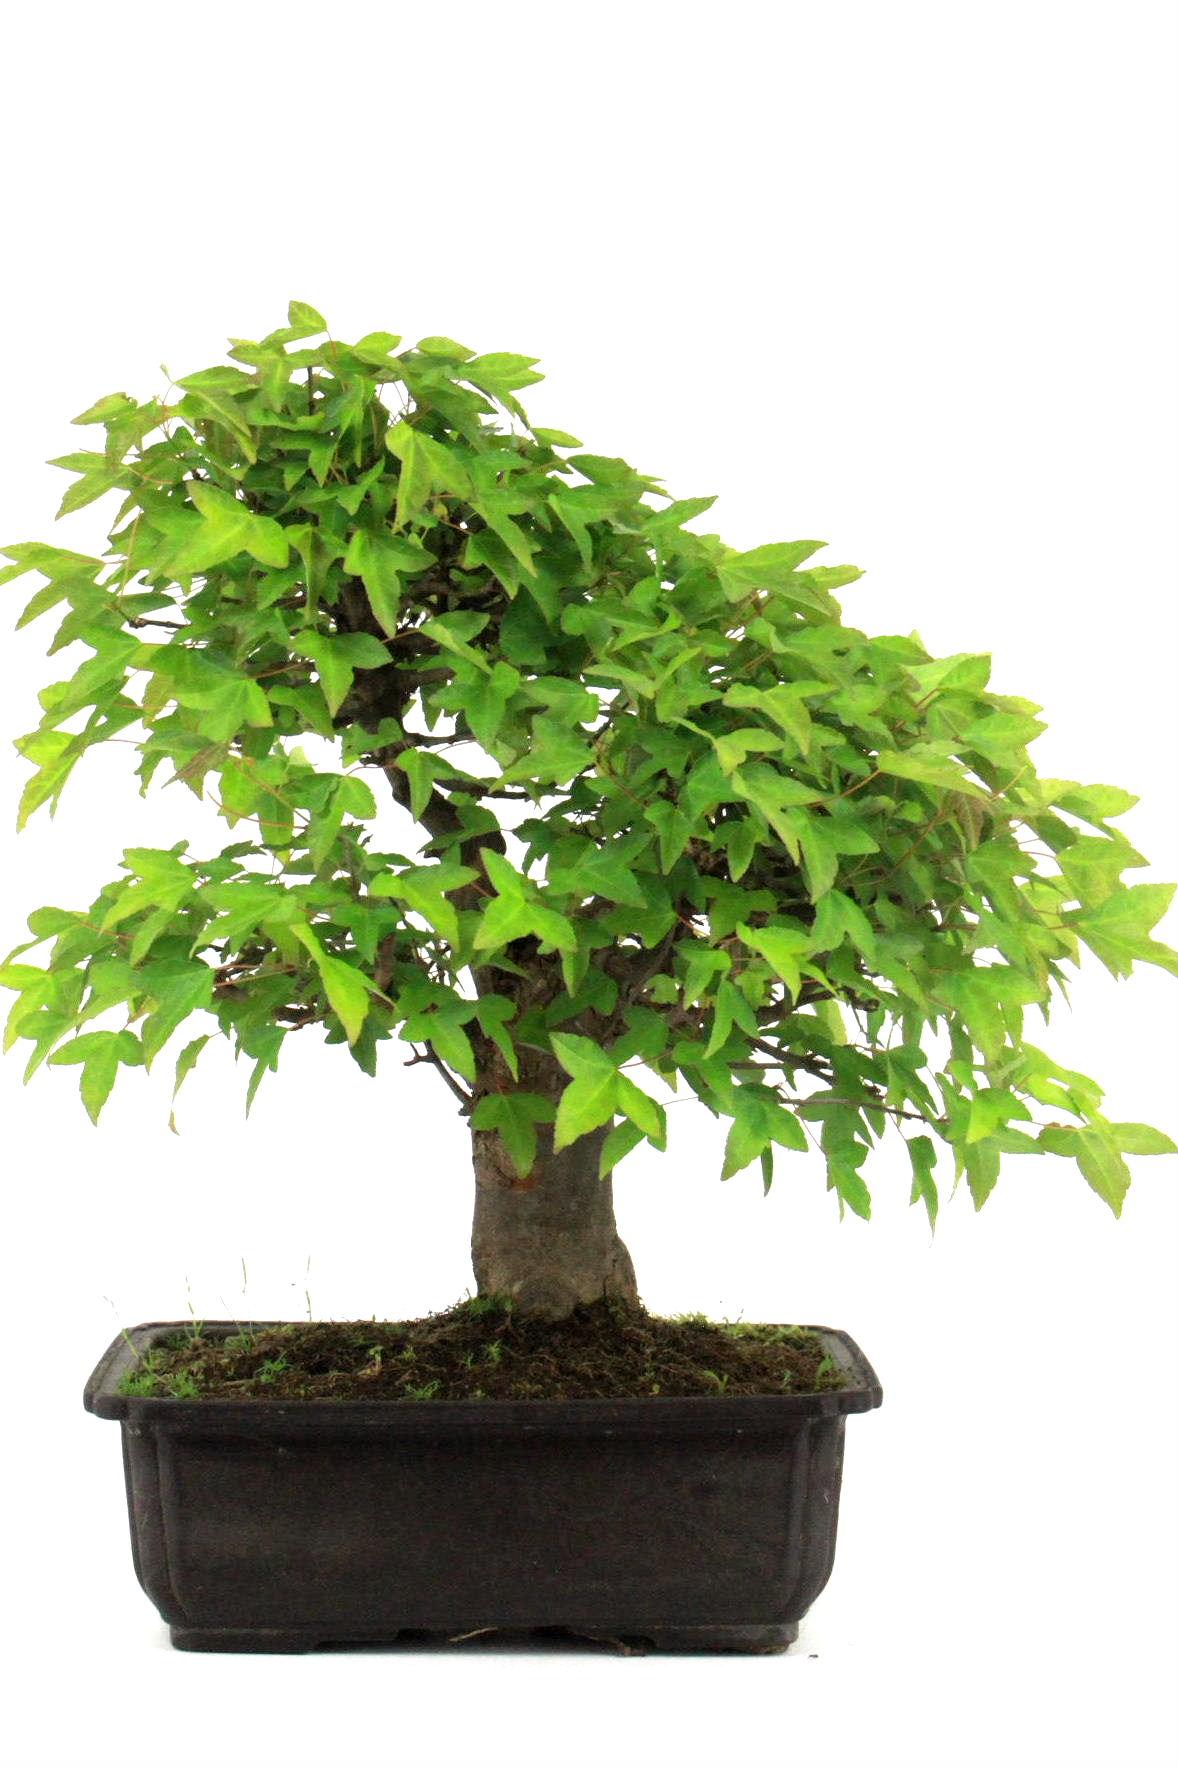 bonsai dreispitz ahorn 45 cm 2614 bei oyaki bonsai kaufen. Black Bedroom Furniture Sets. Home Design Ideas